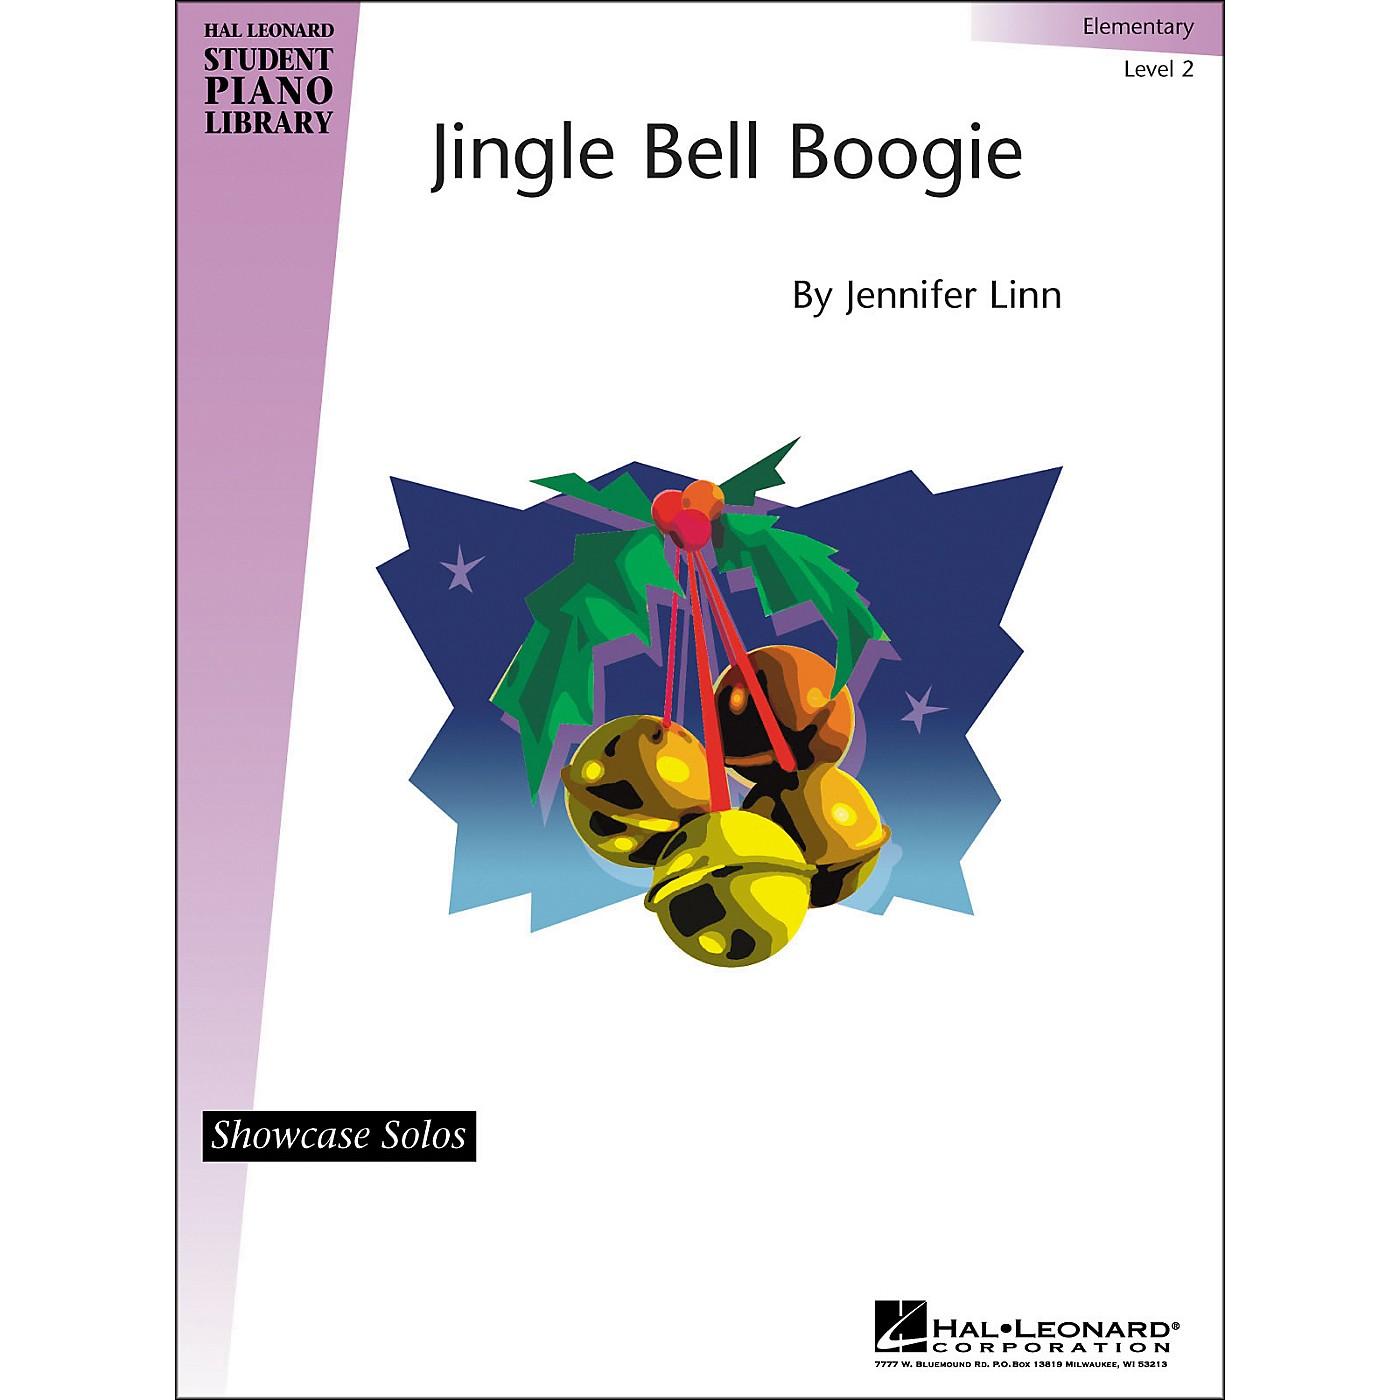 Hal Leonard Jingle Bell Boogie Elementary Level 2 Showcase Solos Hal Leonard Student Piano Library by Jennifer Linn thumbnail